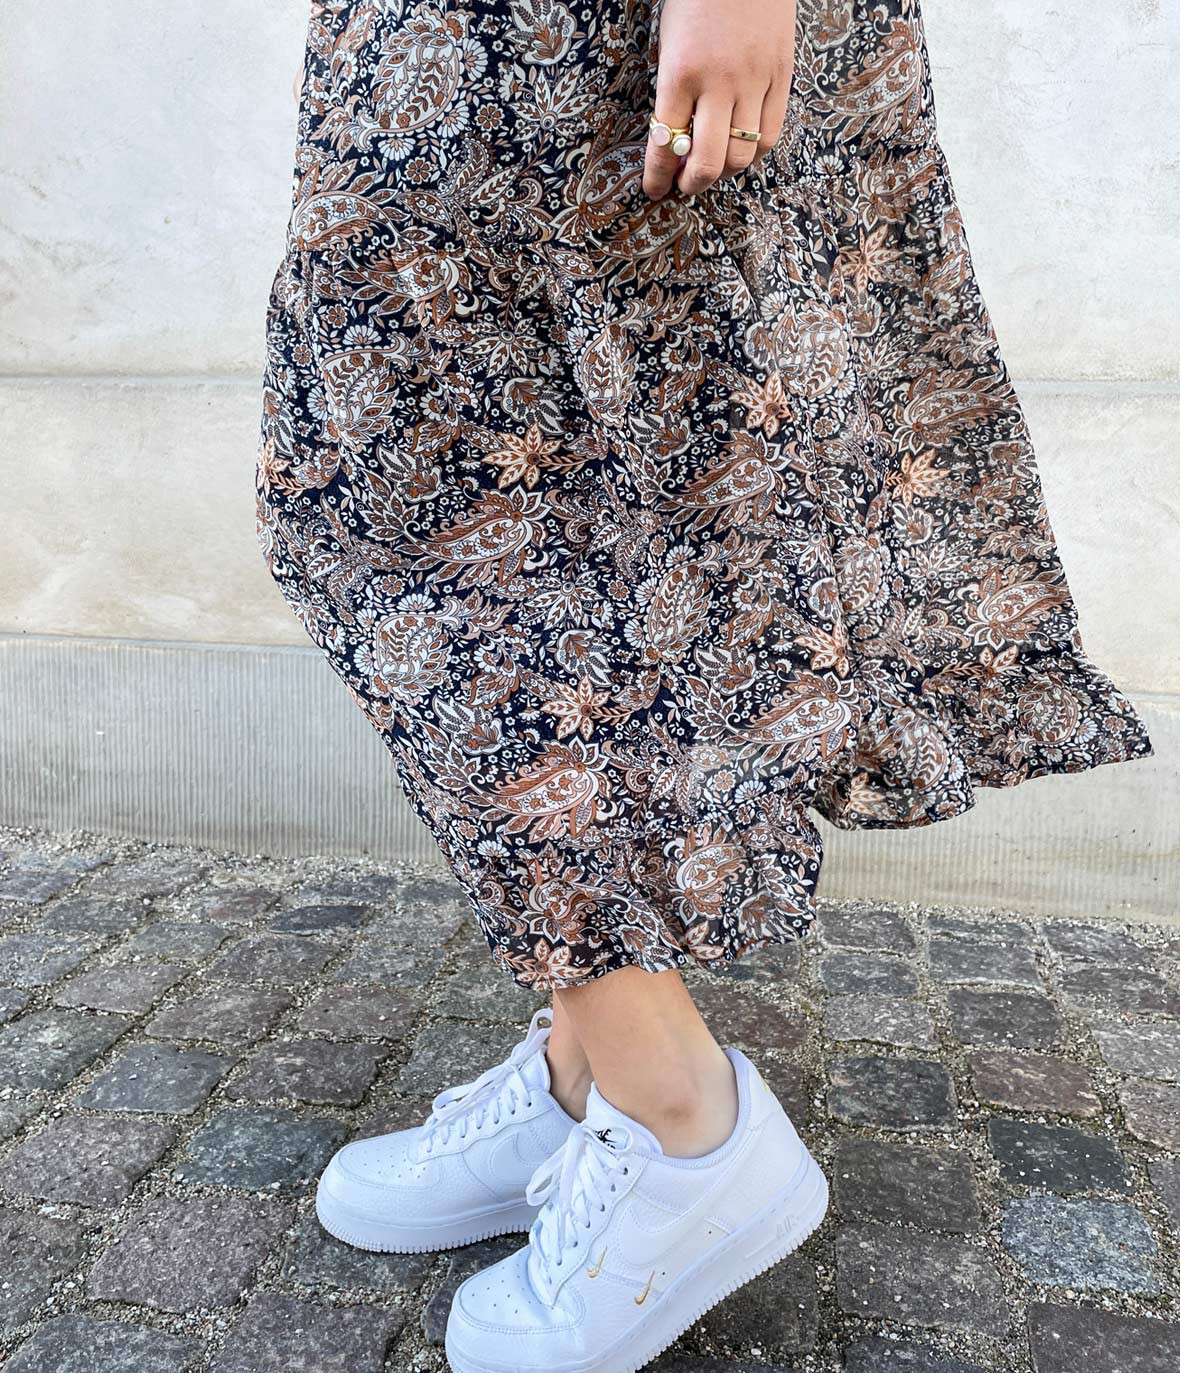 paisley_dress_vimatter.jpg